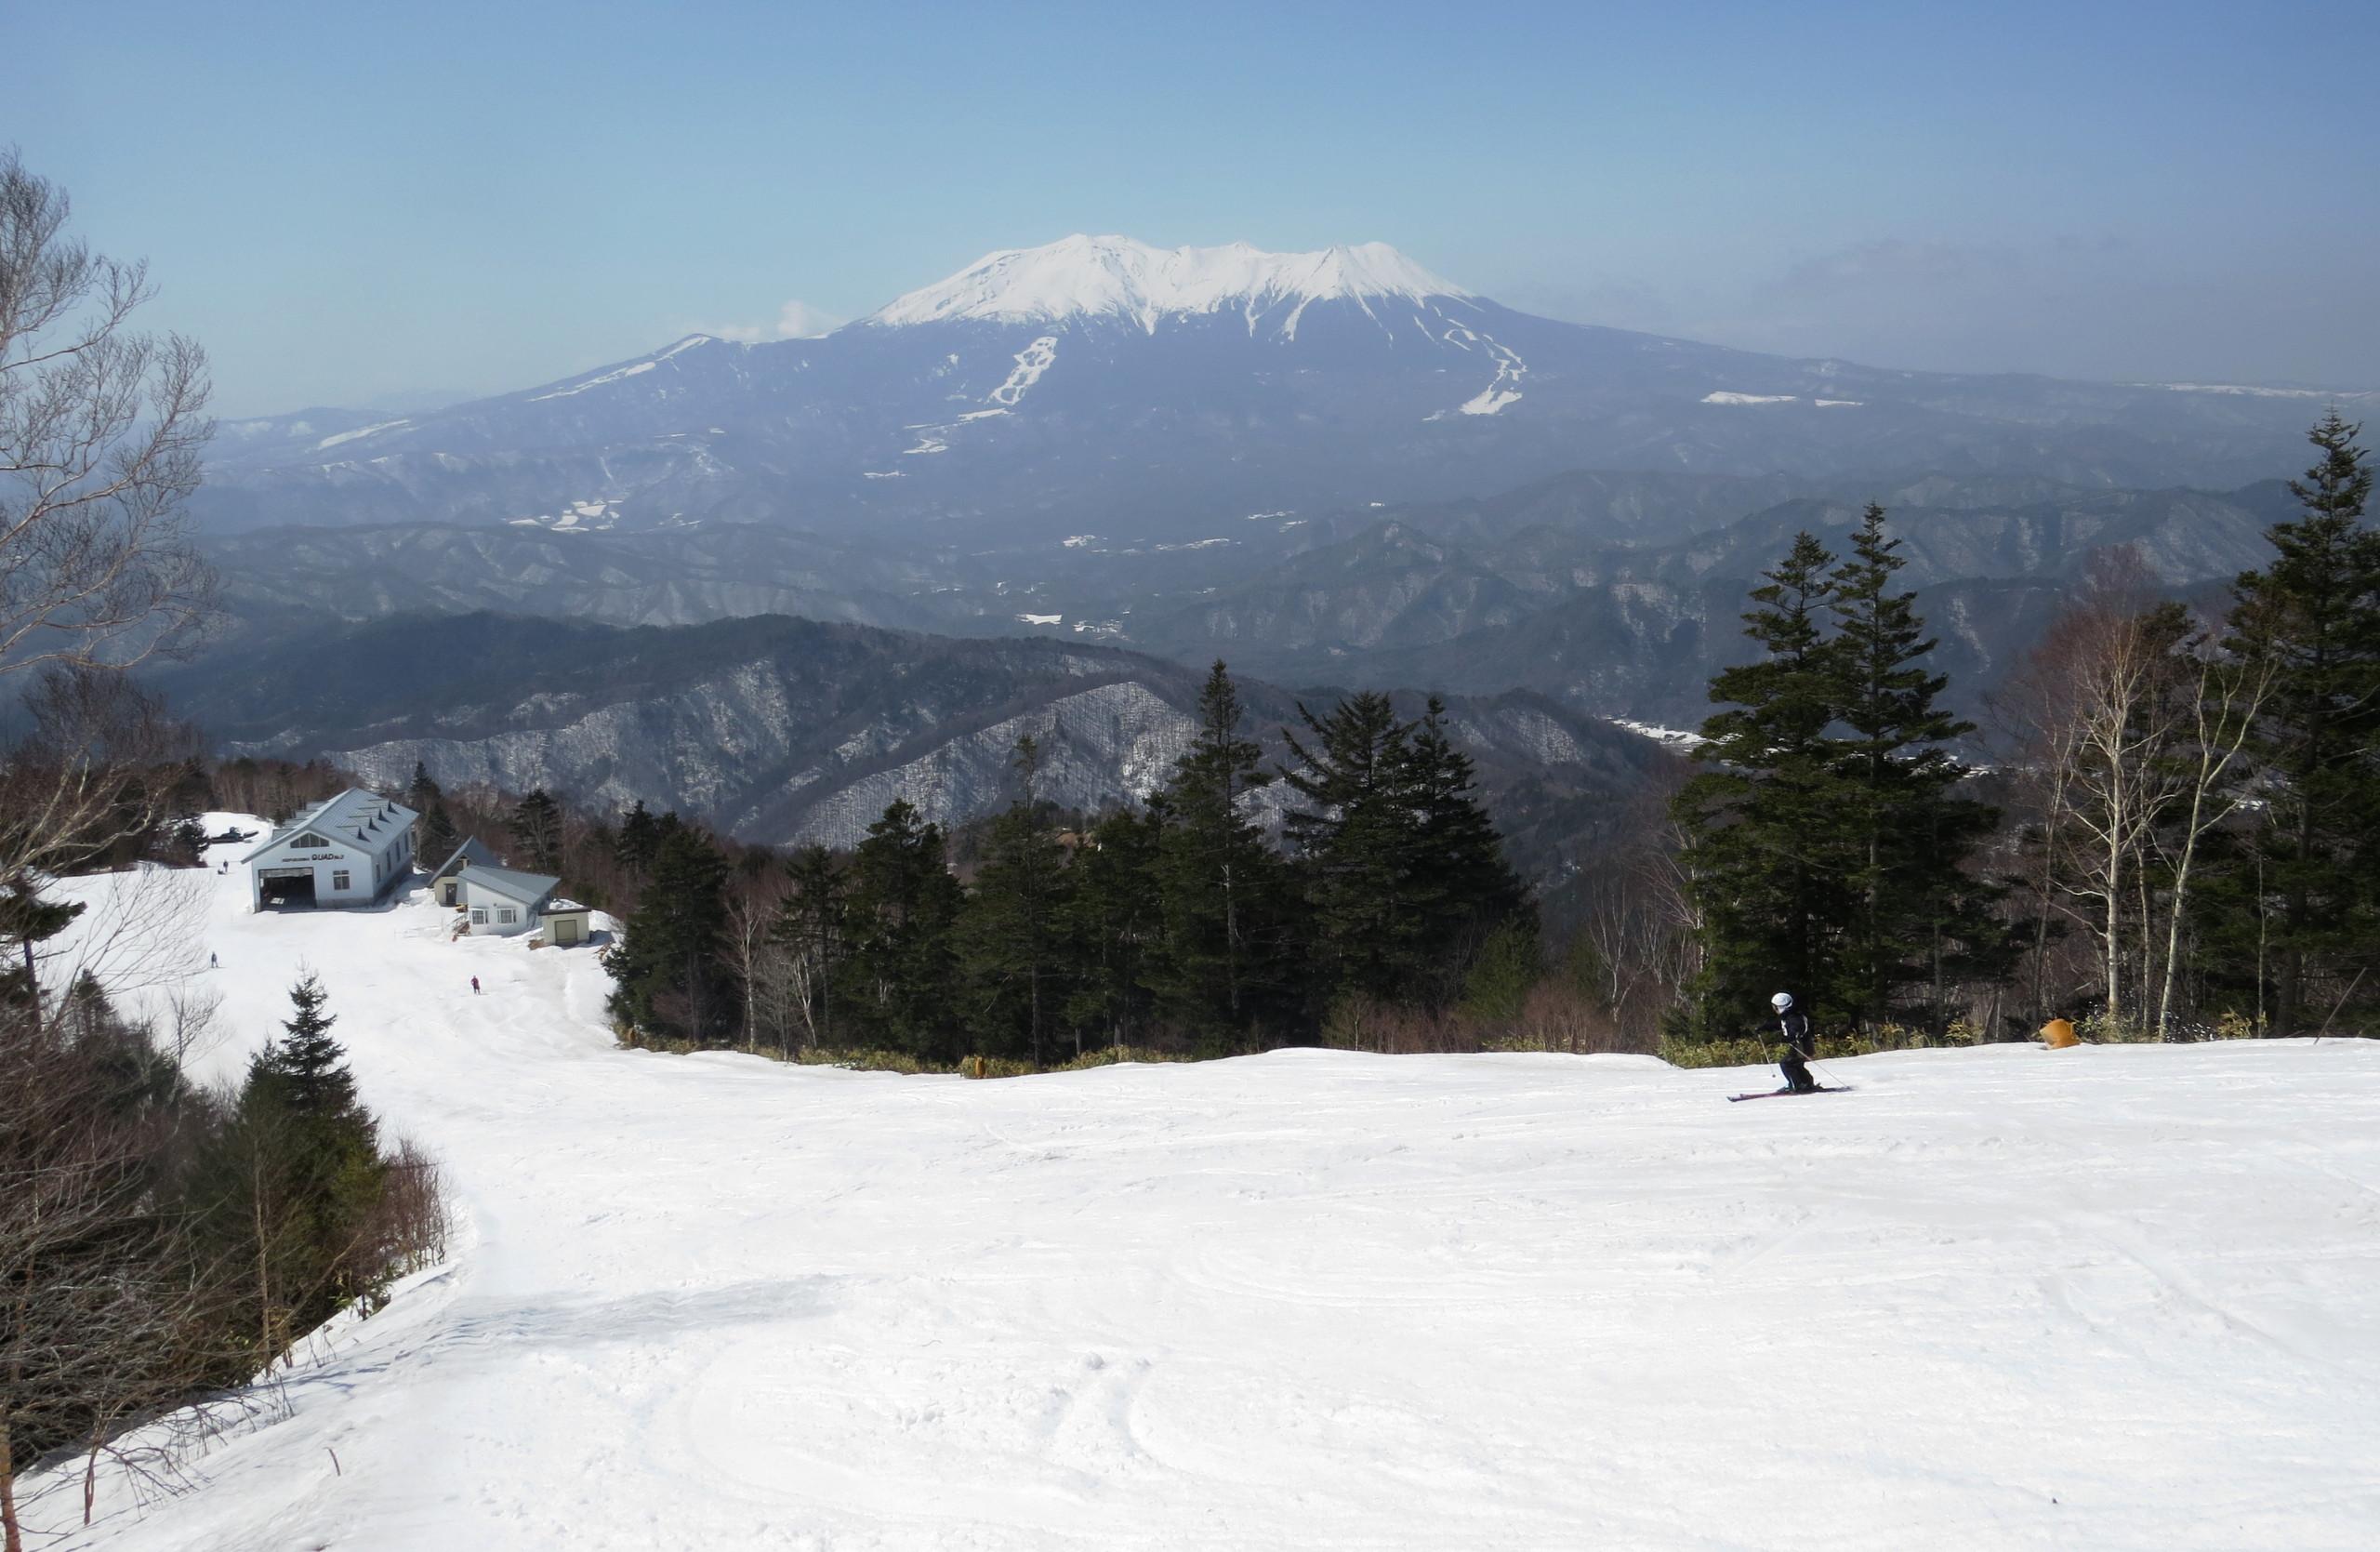 file:mount ontake from kisofukushima ski resort - wikimedia commons